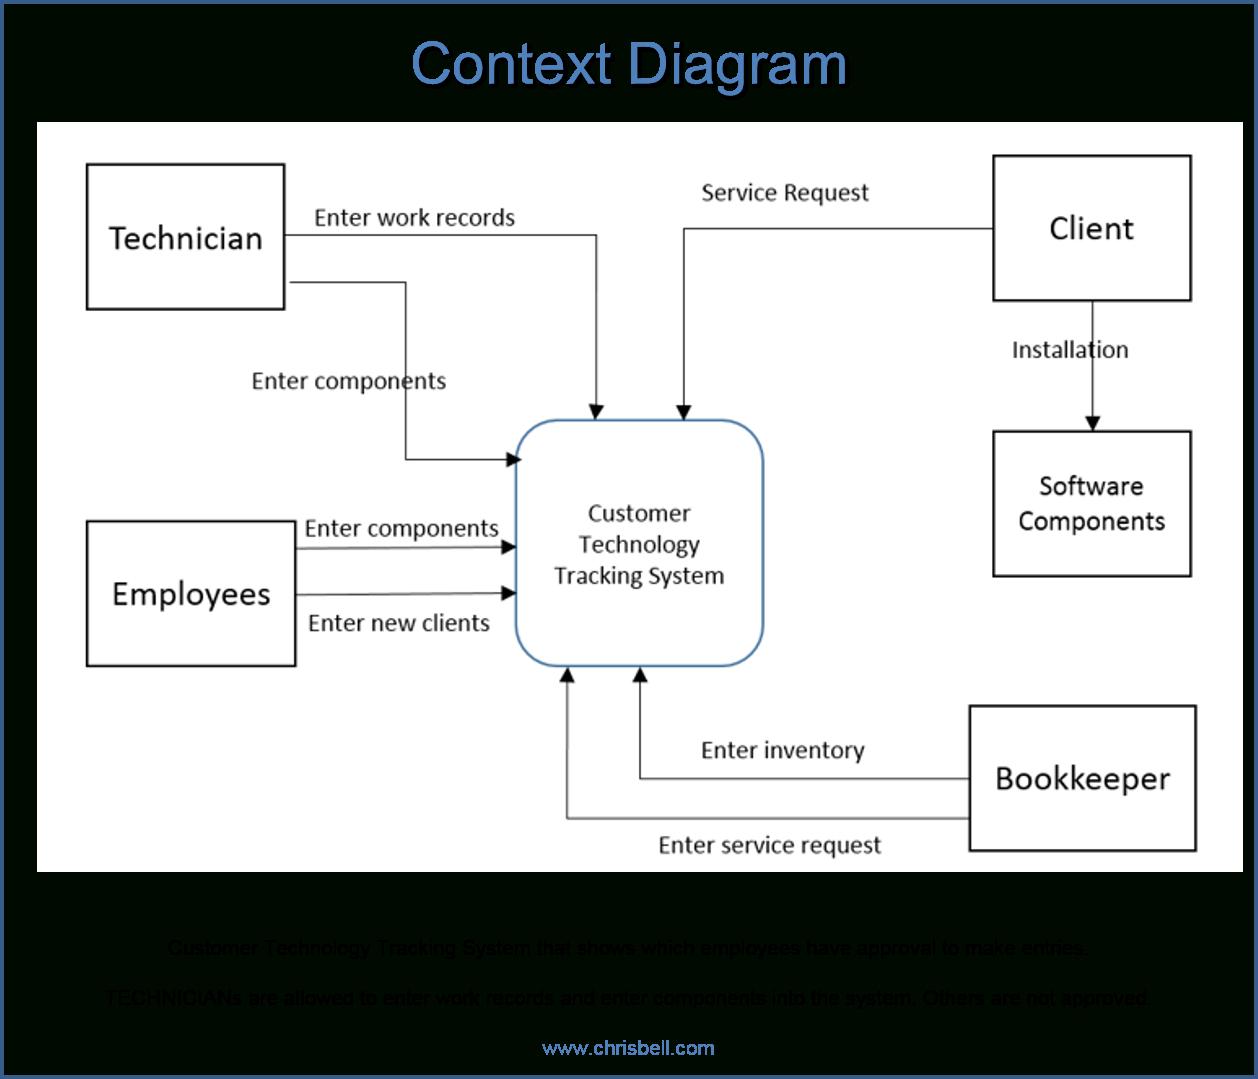 Event, System, Decomposition, Context And Primitive Diagrams throughout Rdbms Diagram